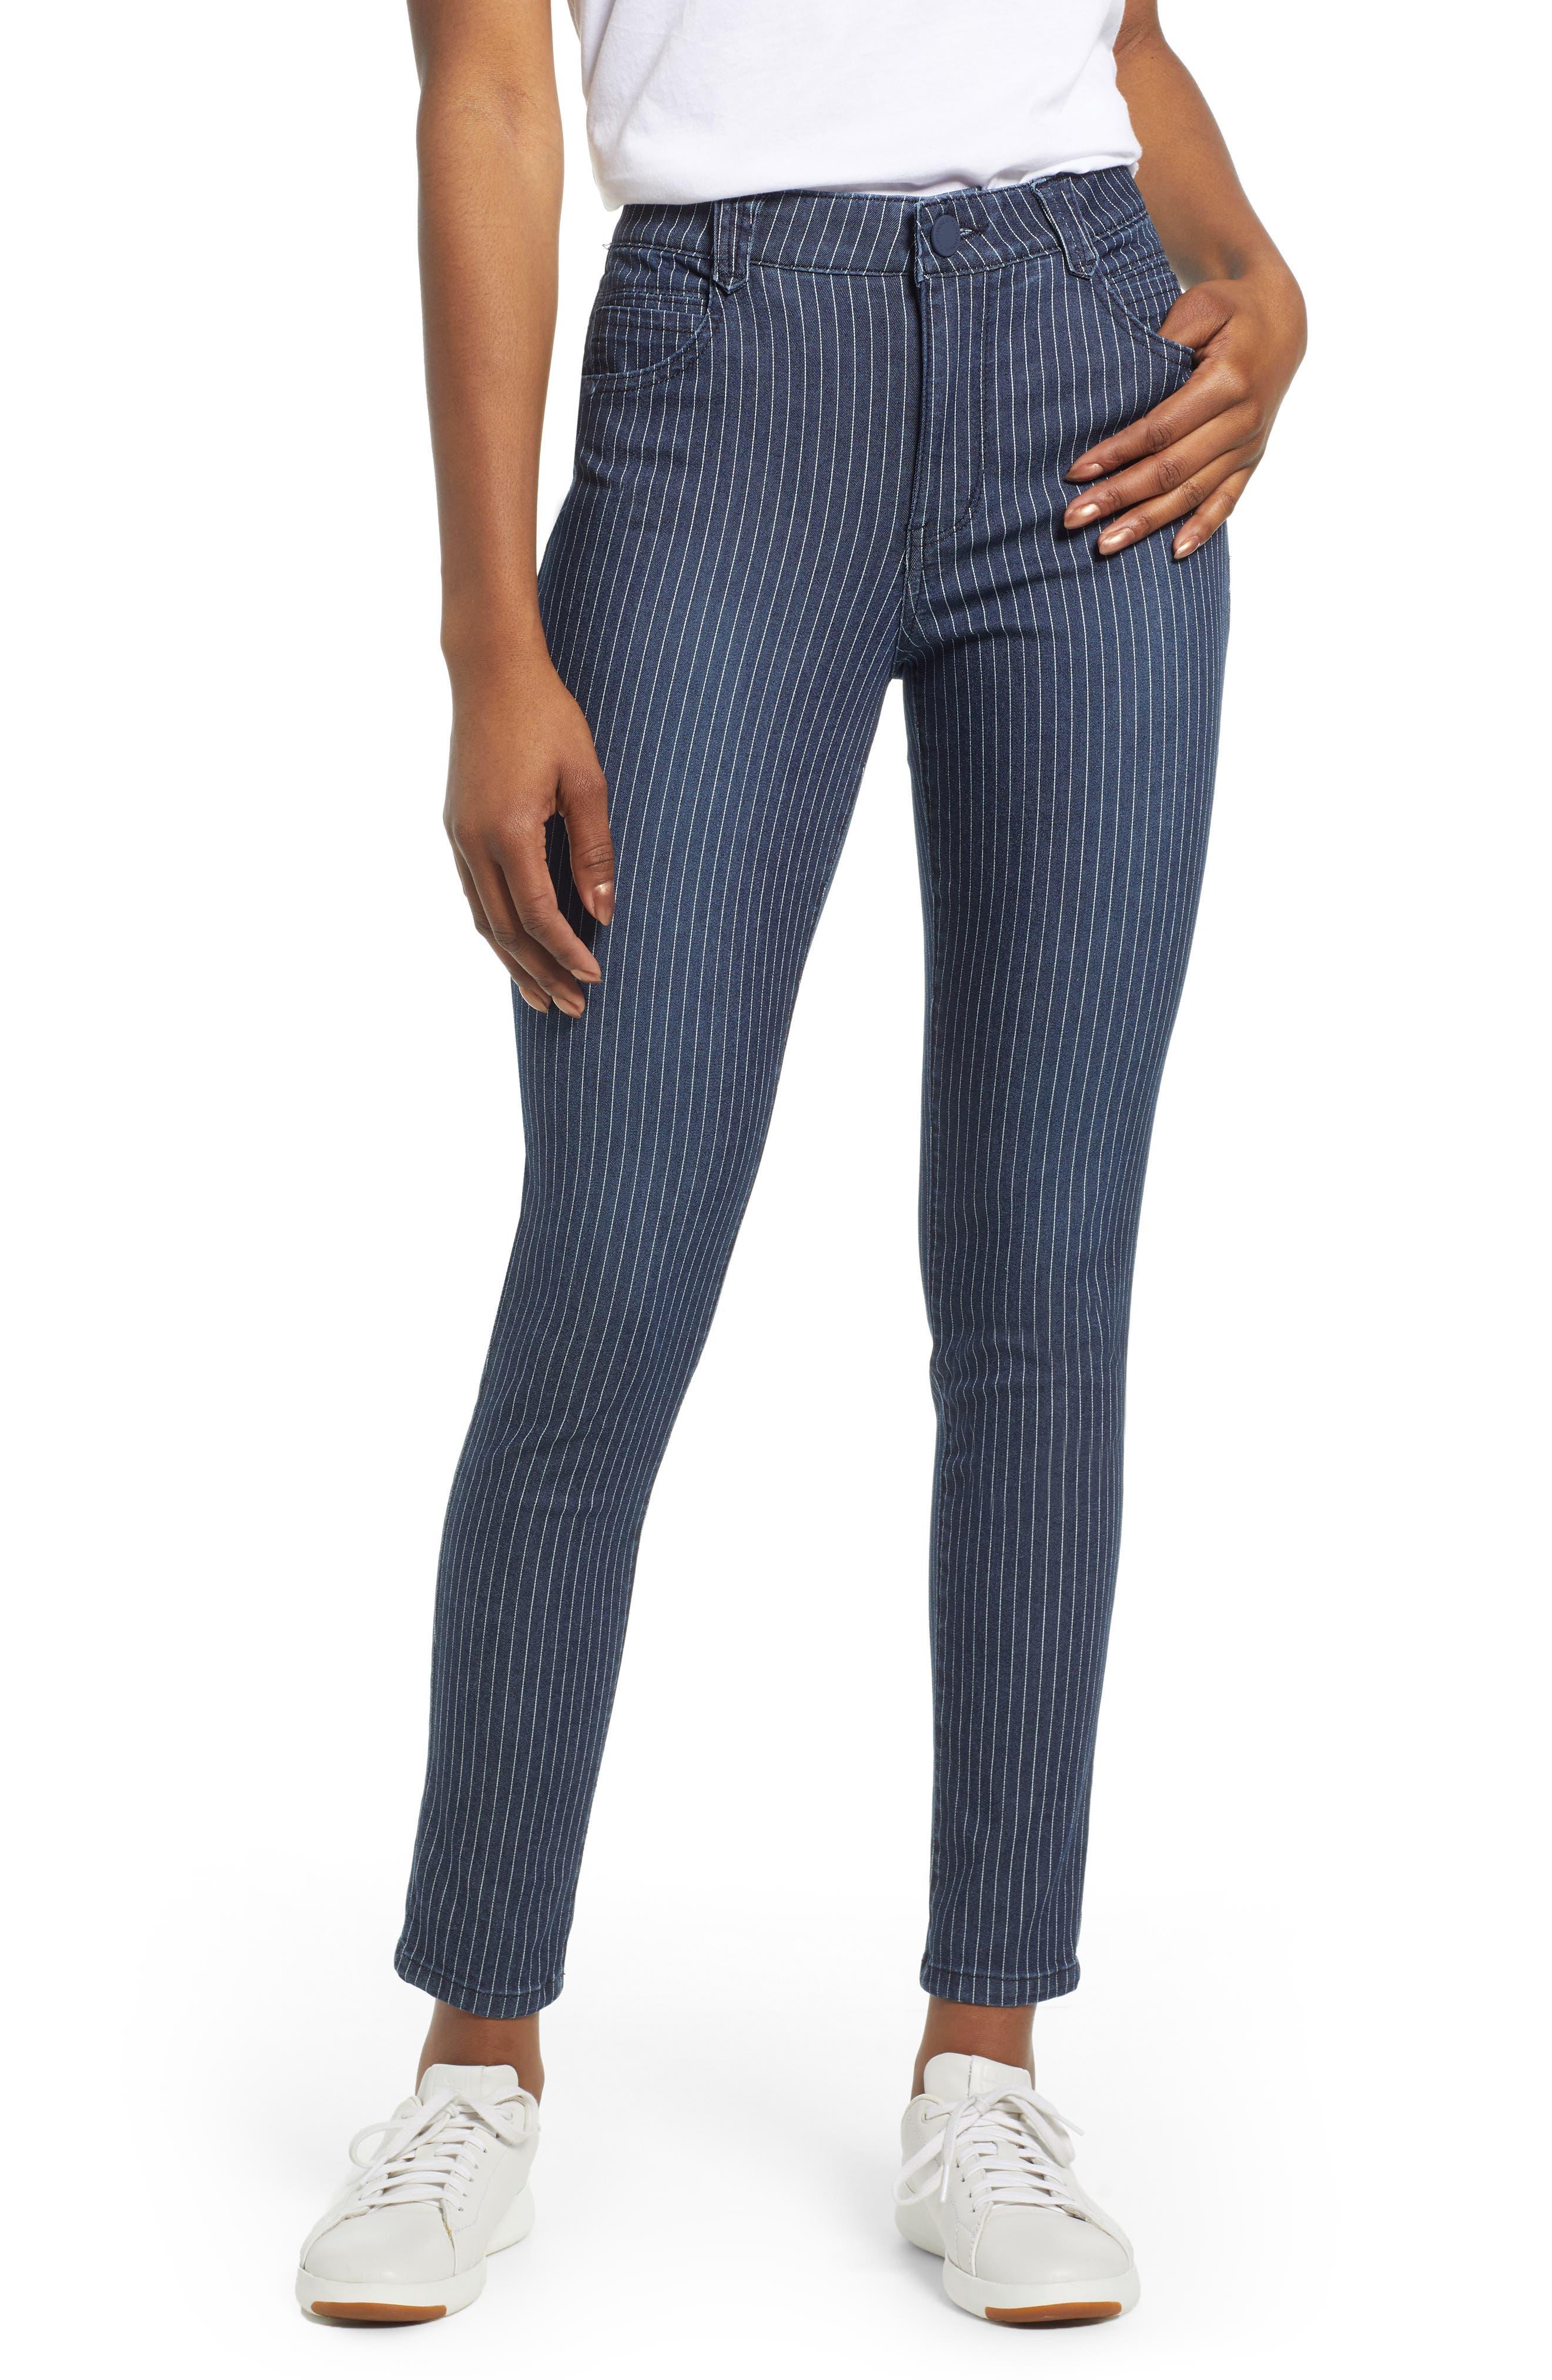 Petite Women's Wit & Wisdom Ab-Solution Stripe High Waist Crop Skinny Jeans